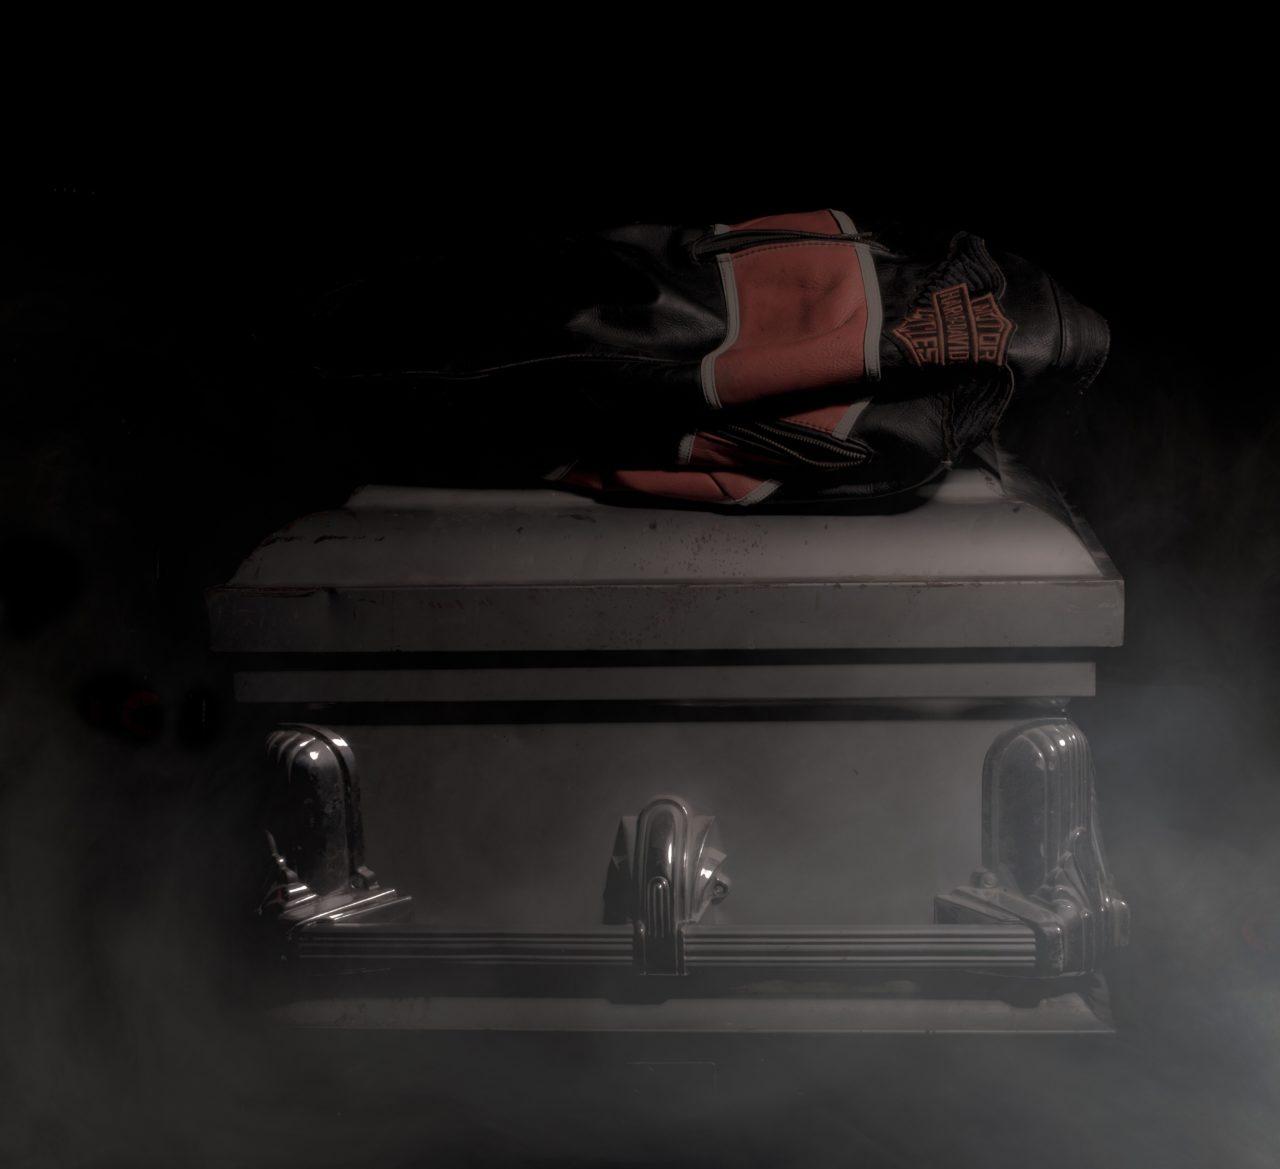 coffin-602657-1280x1169.jpg